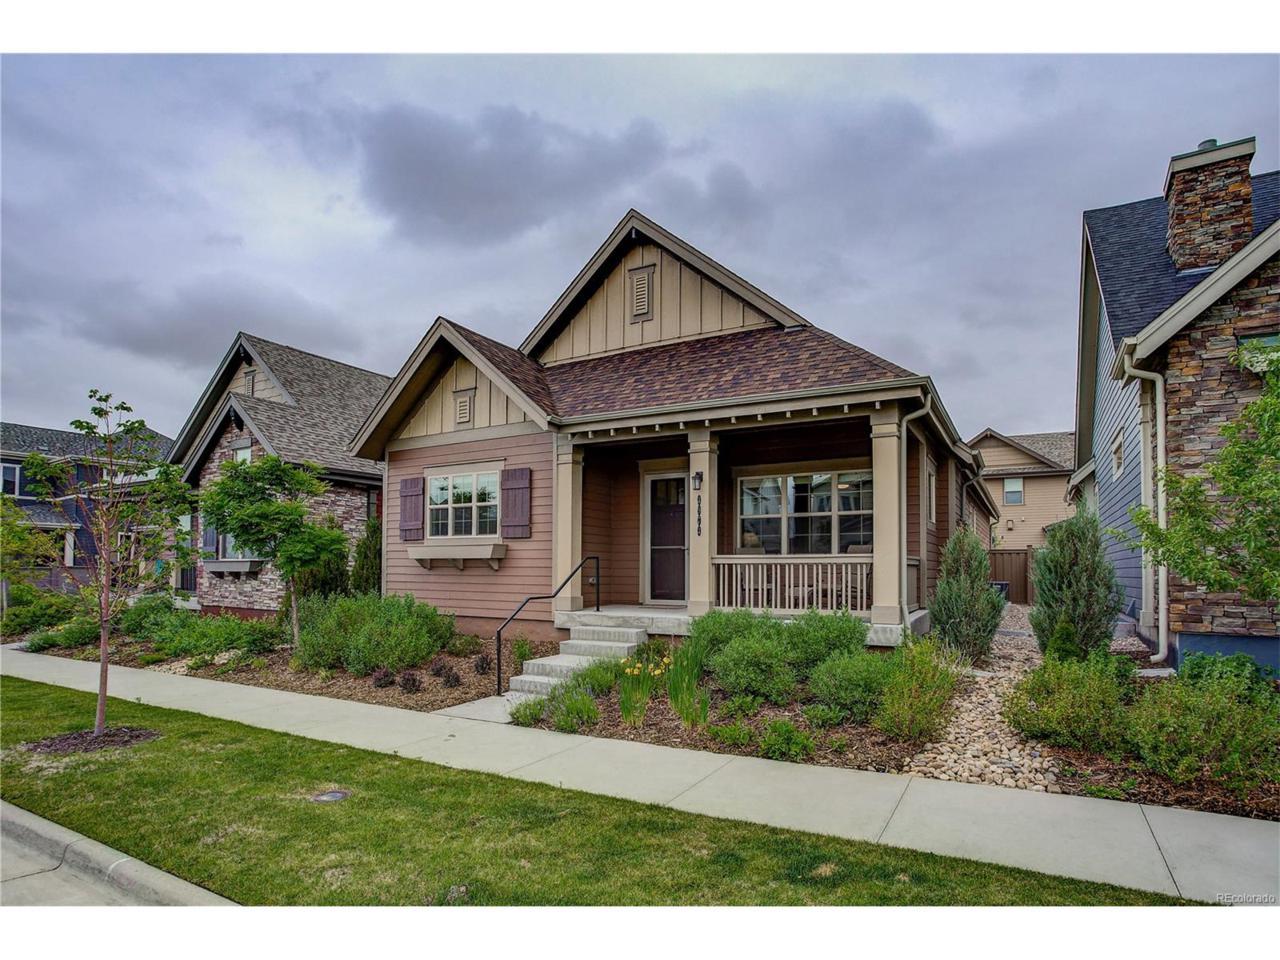 4974 Willow Street, Denver, CO 80238 (MLS #4449631) :: 8z Real Estate